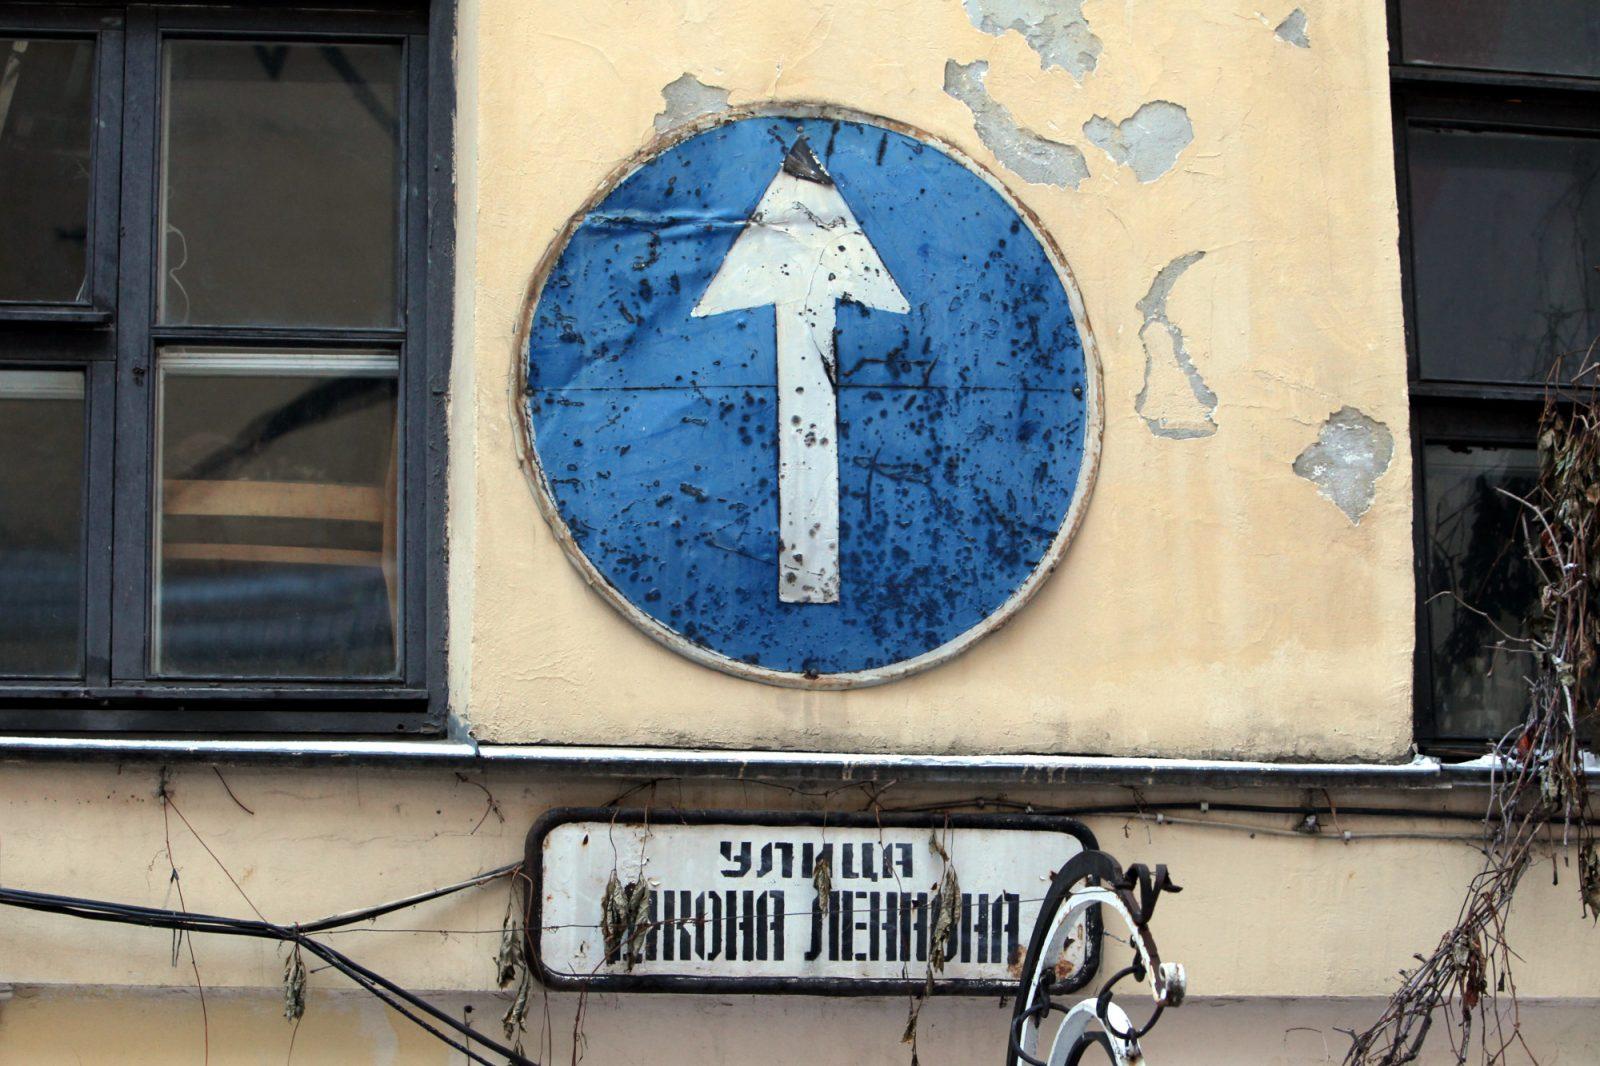 день Битлз арт-центр Пушкинская 10 улица Джона Леннона